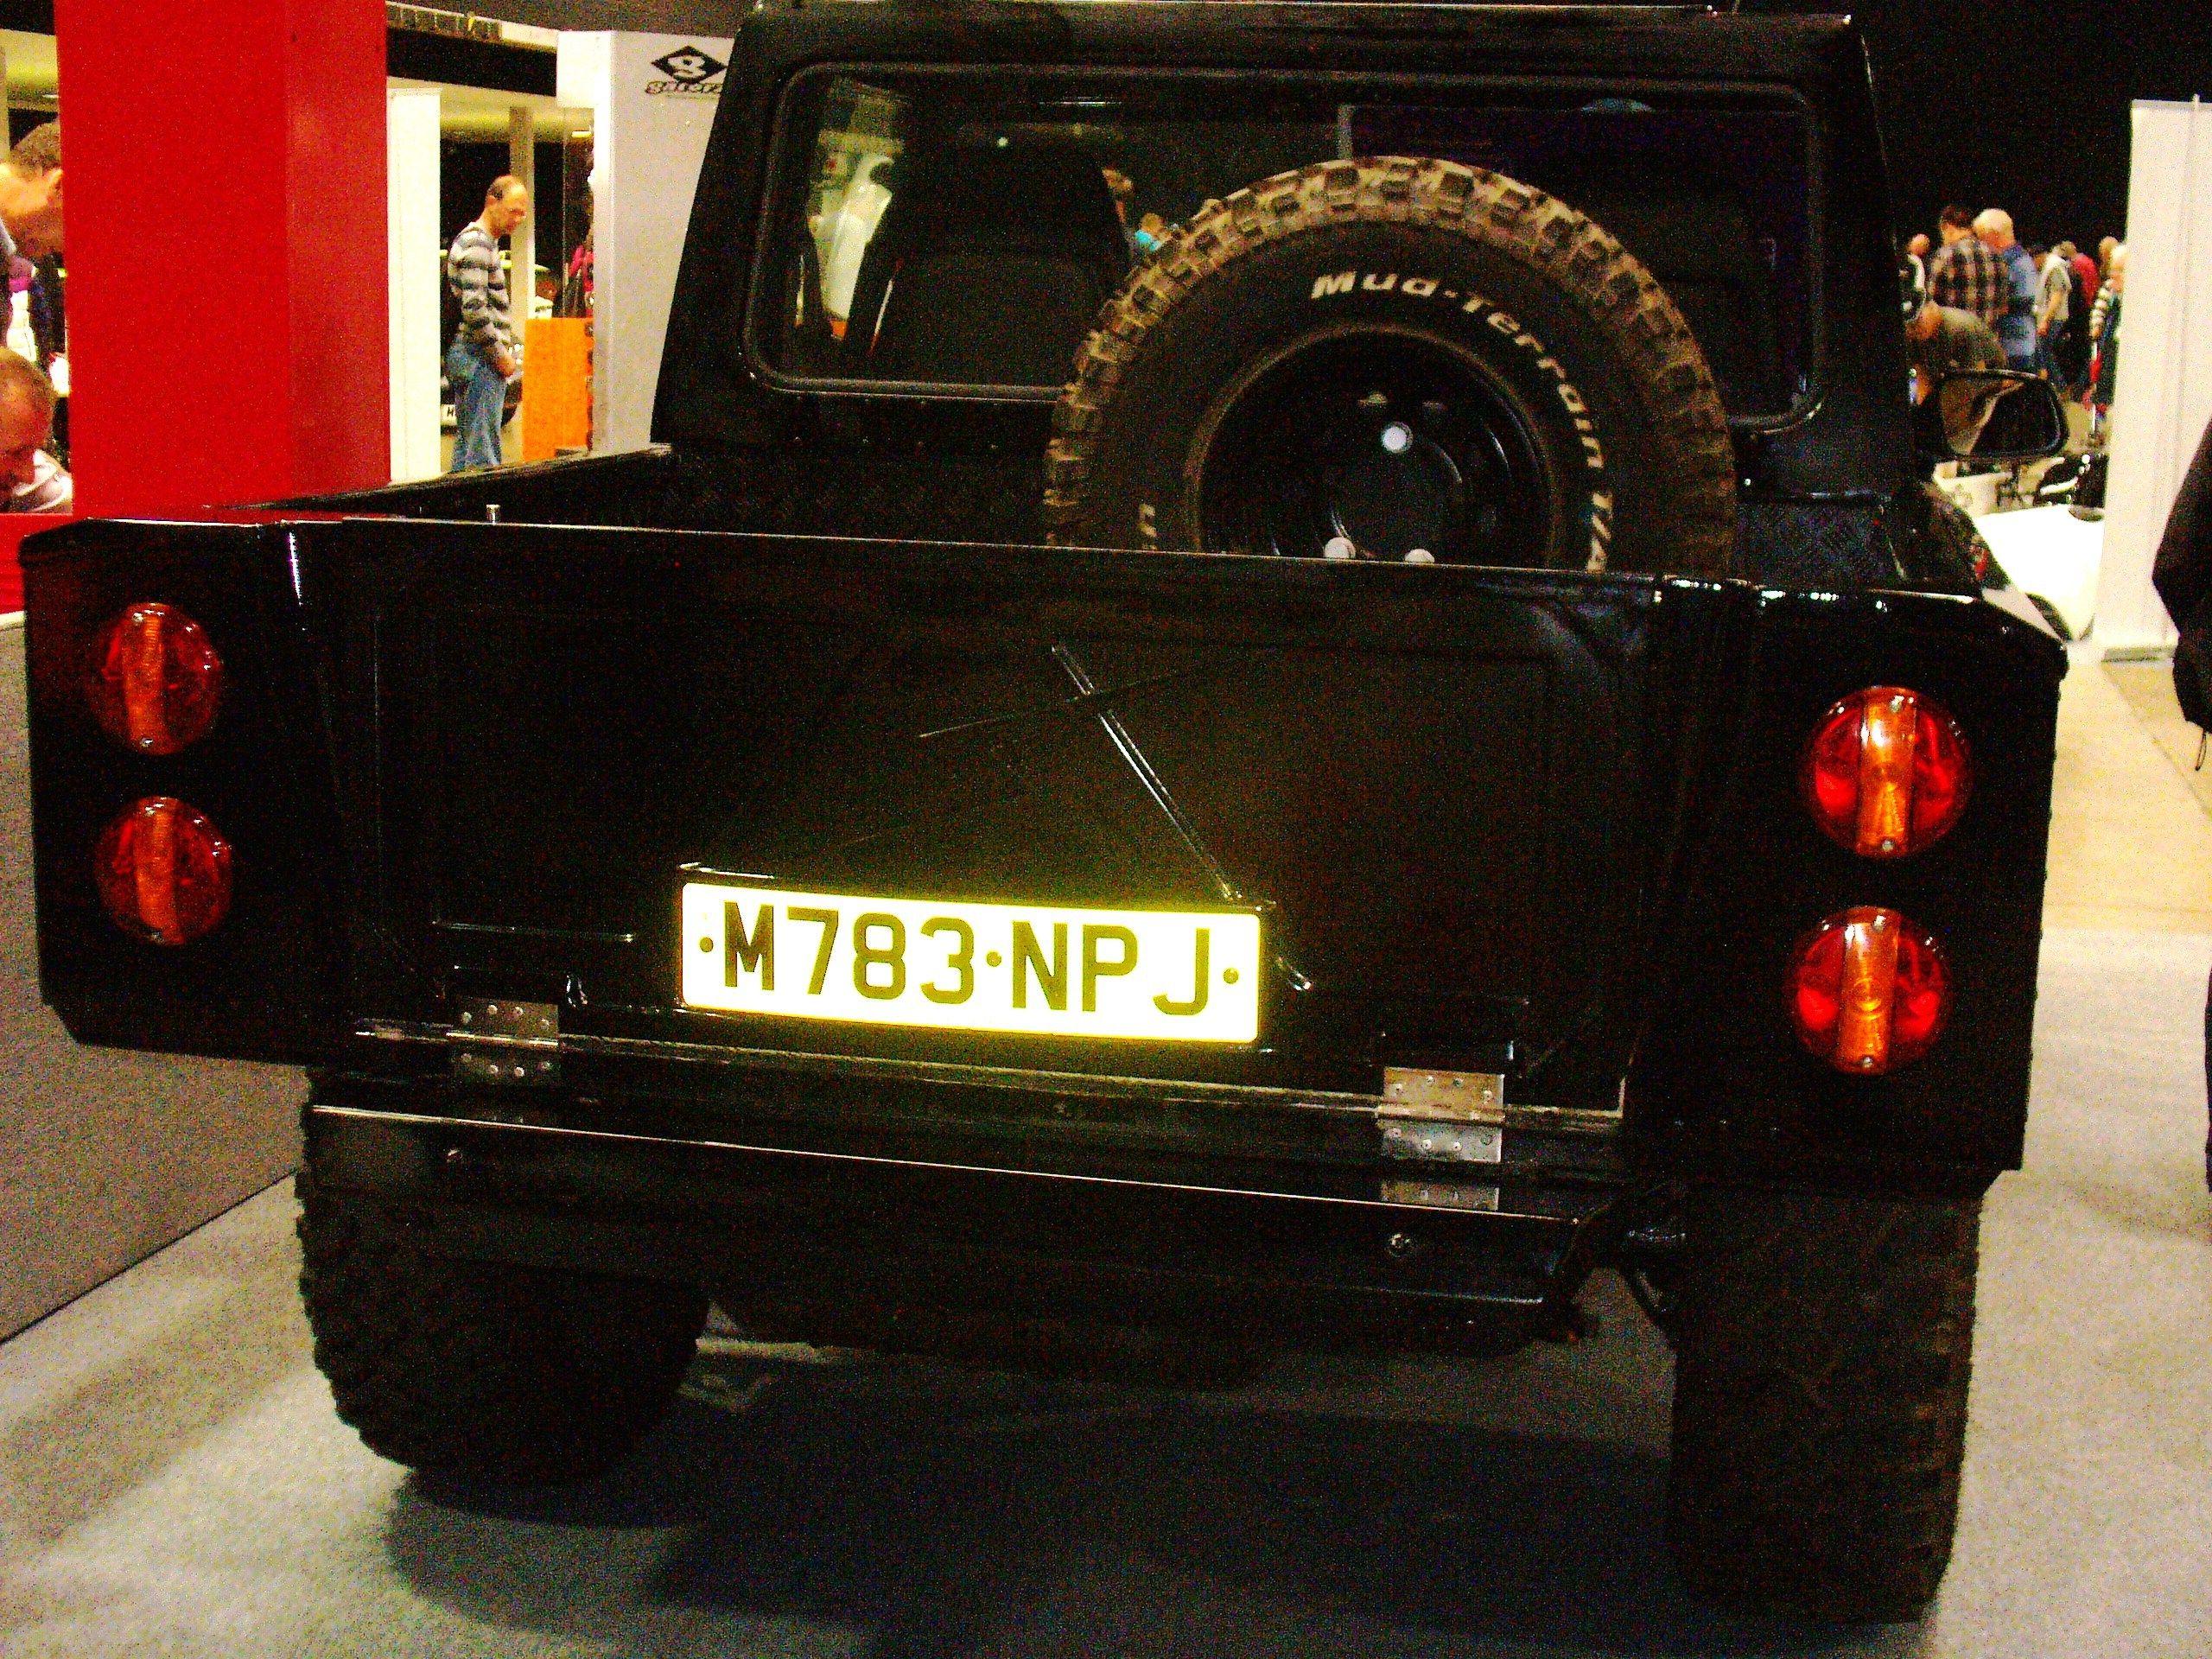 Landrover Discovery mk1 based kit car England